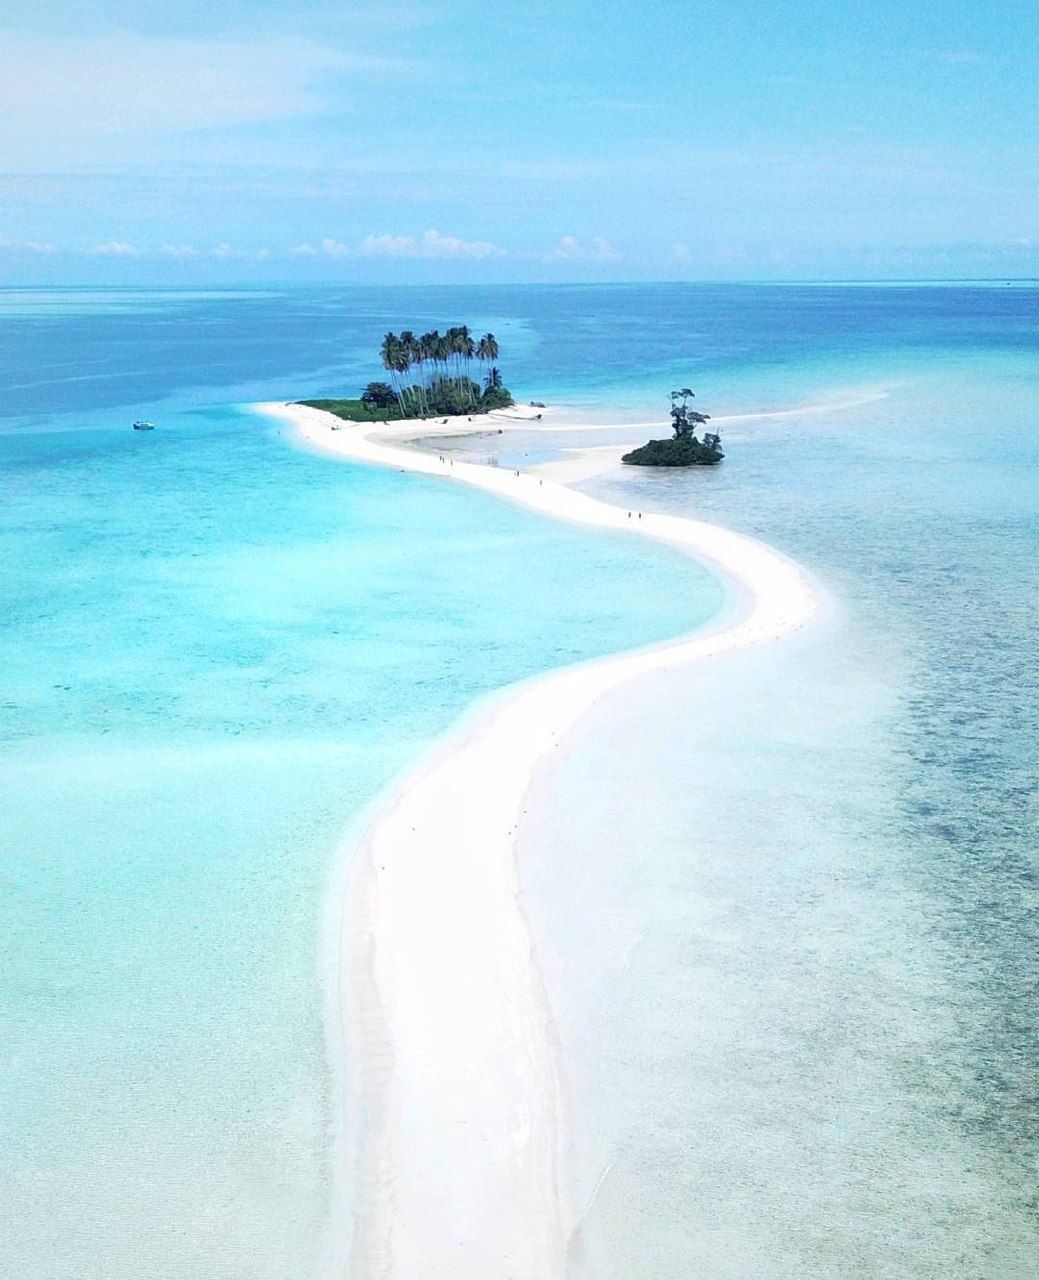 Private Island Beaches: A Beautiful Private Island In East Kalimantan, Manimbora